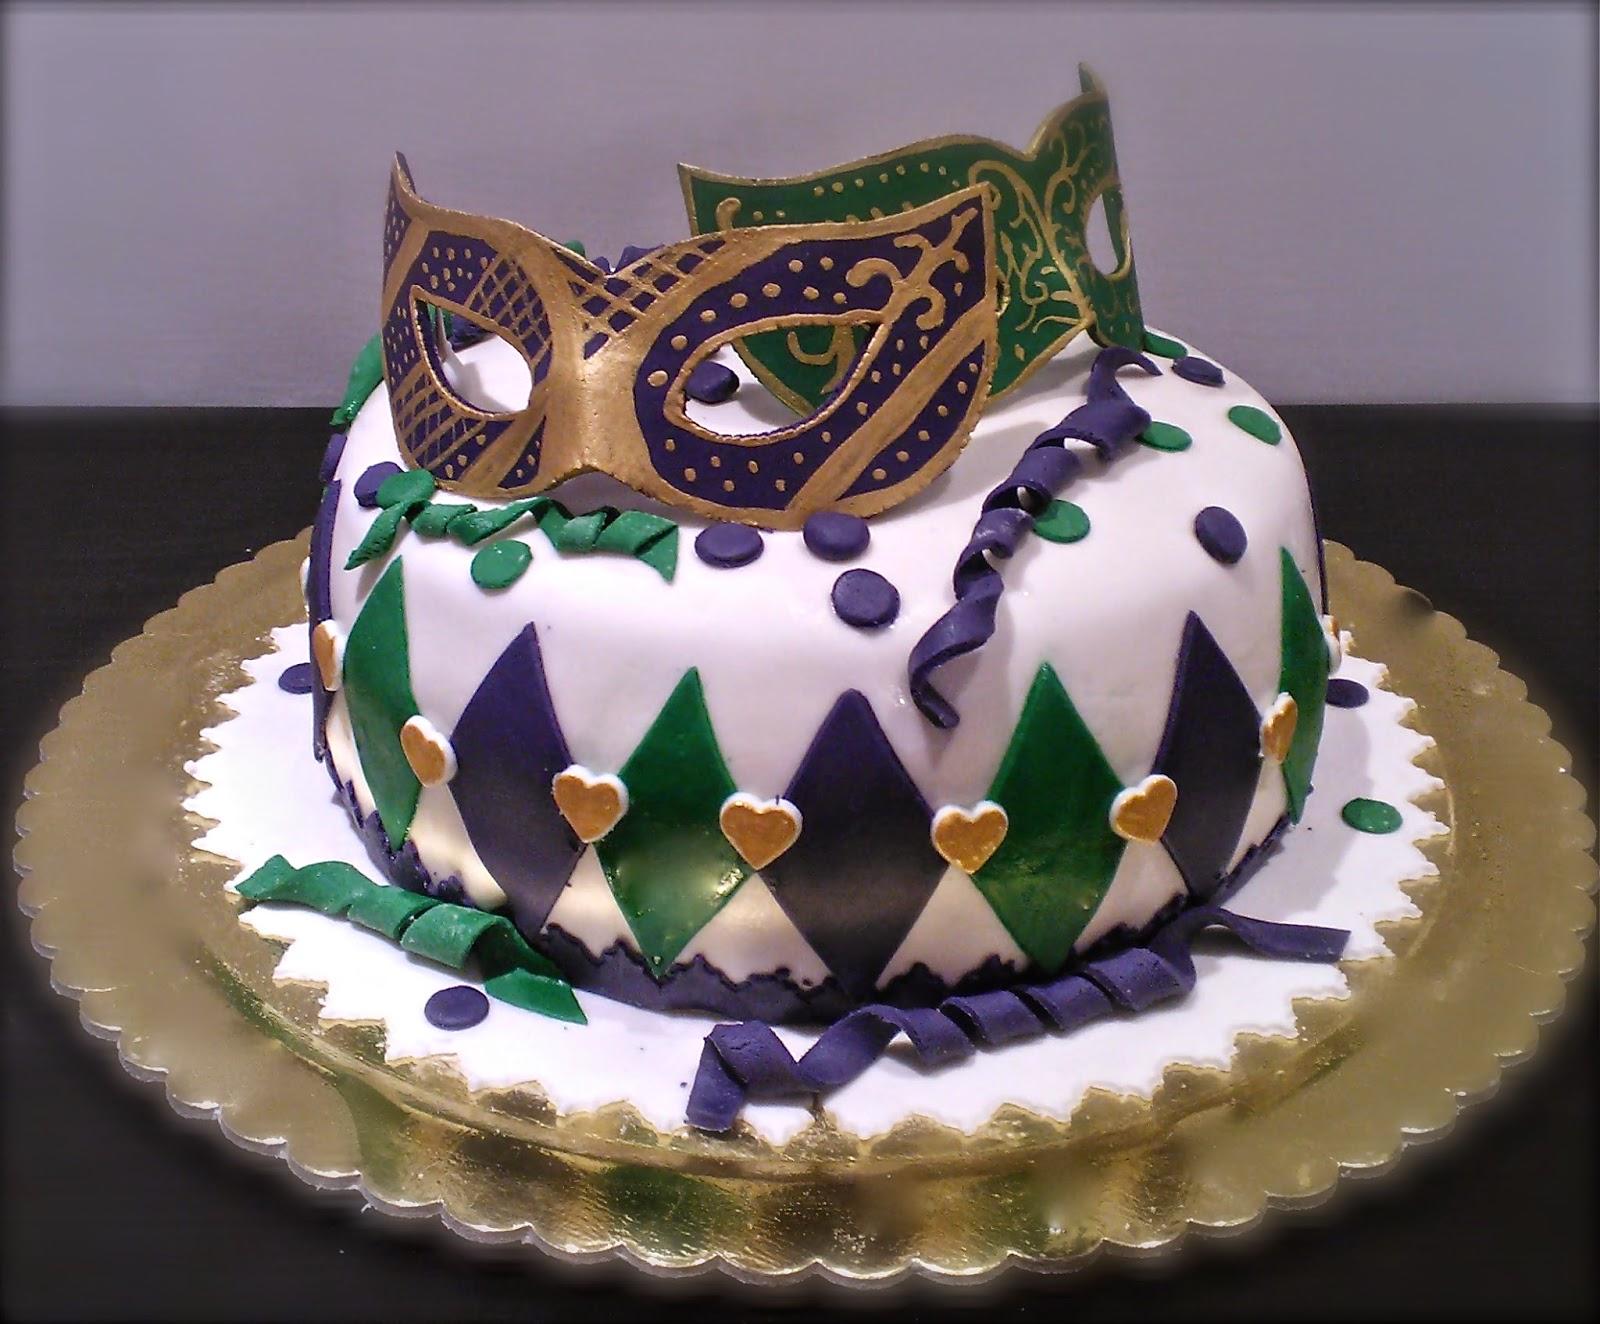 Le torte di patricia torta di carnevale con maschere - Decorazioni per torte di carnevale ...